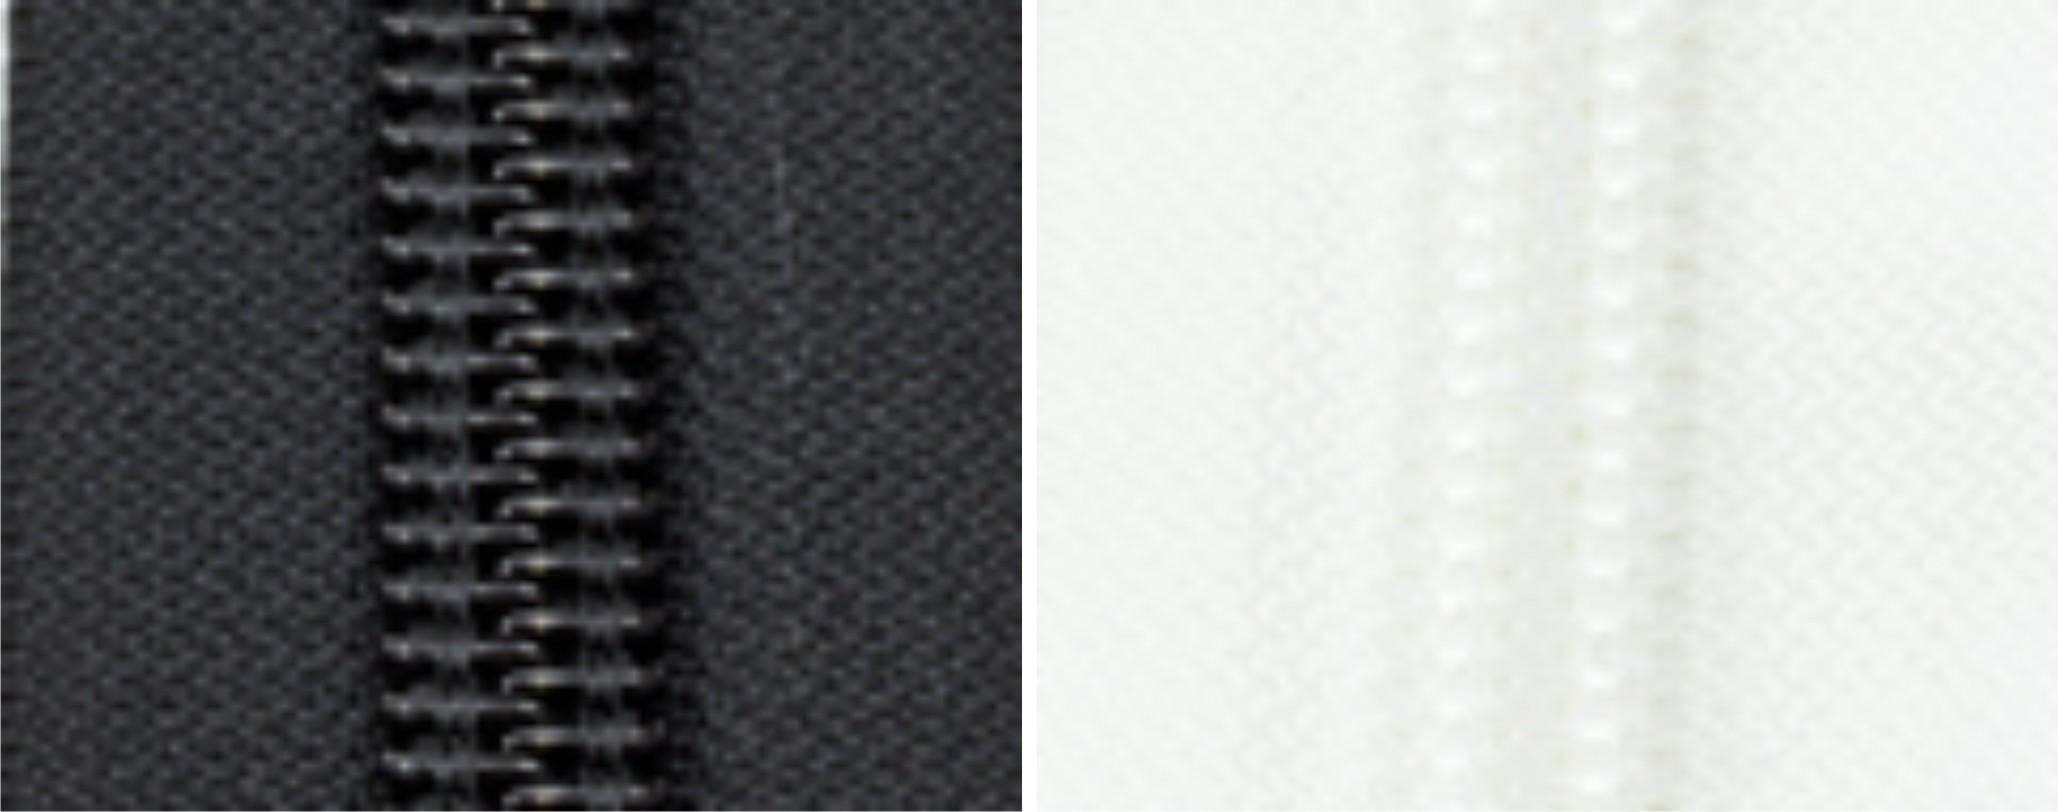 "#10CF YKK Ziplon Zipper - Chain 11/16"" Tape."